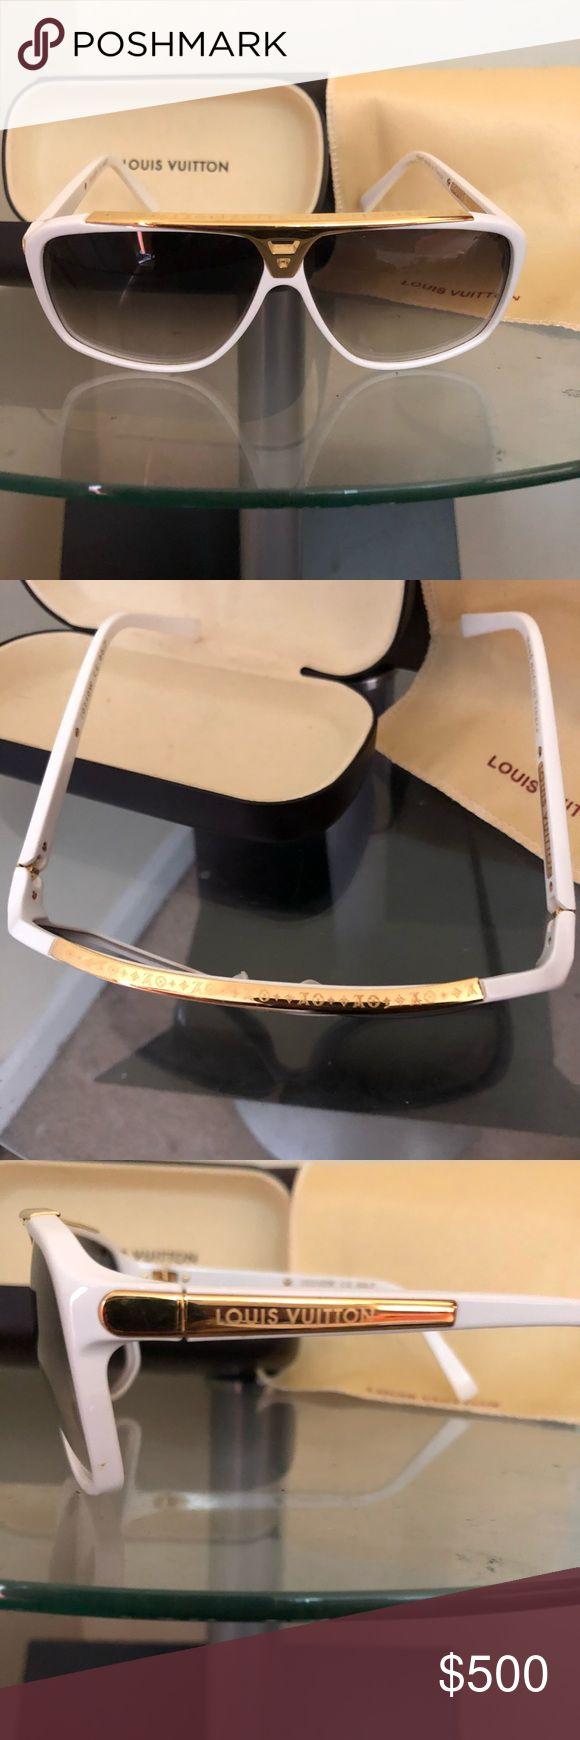 Authentic Louis Vuitton EVIDENCE sunglasses White aviators Accessories Glasses